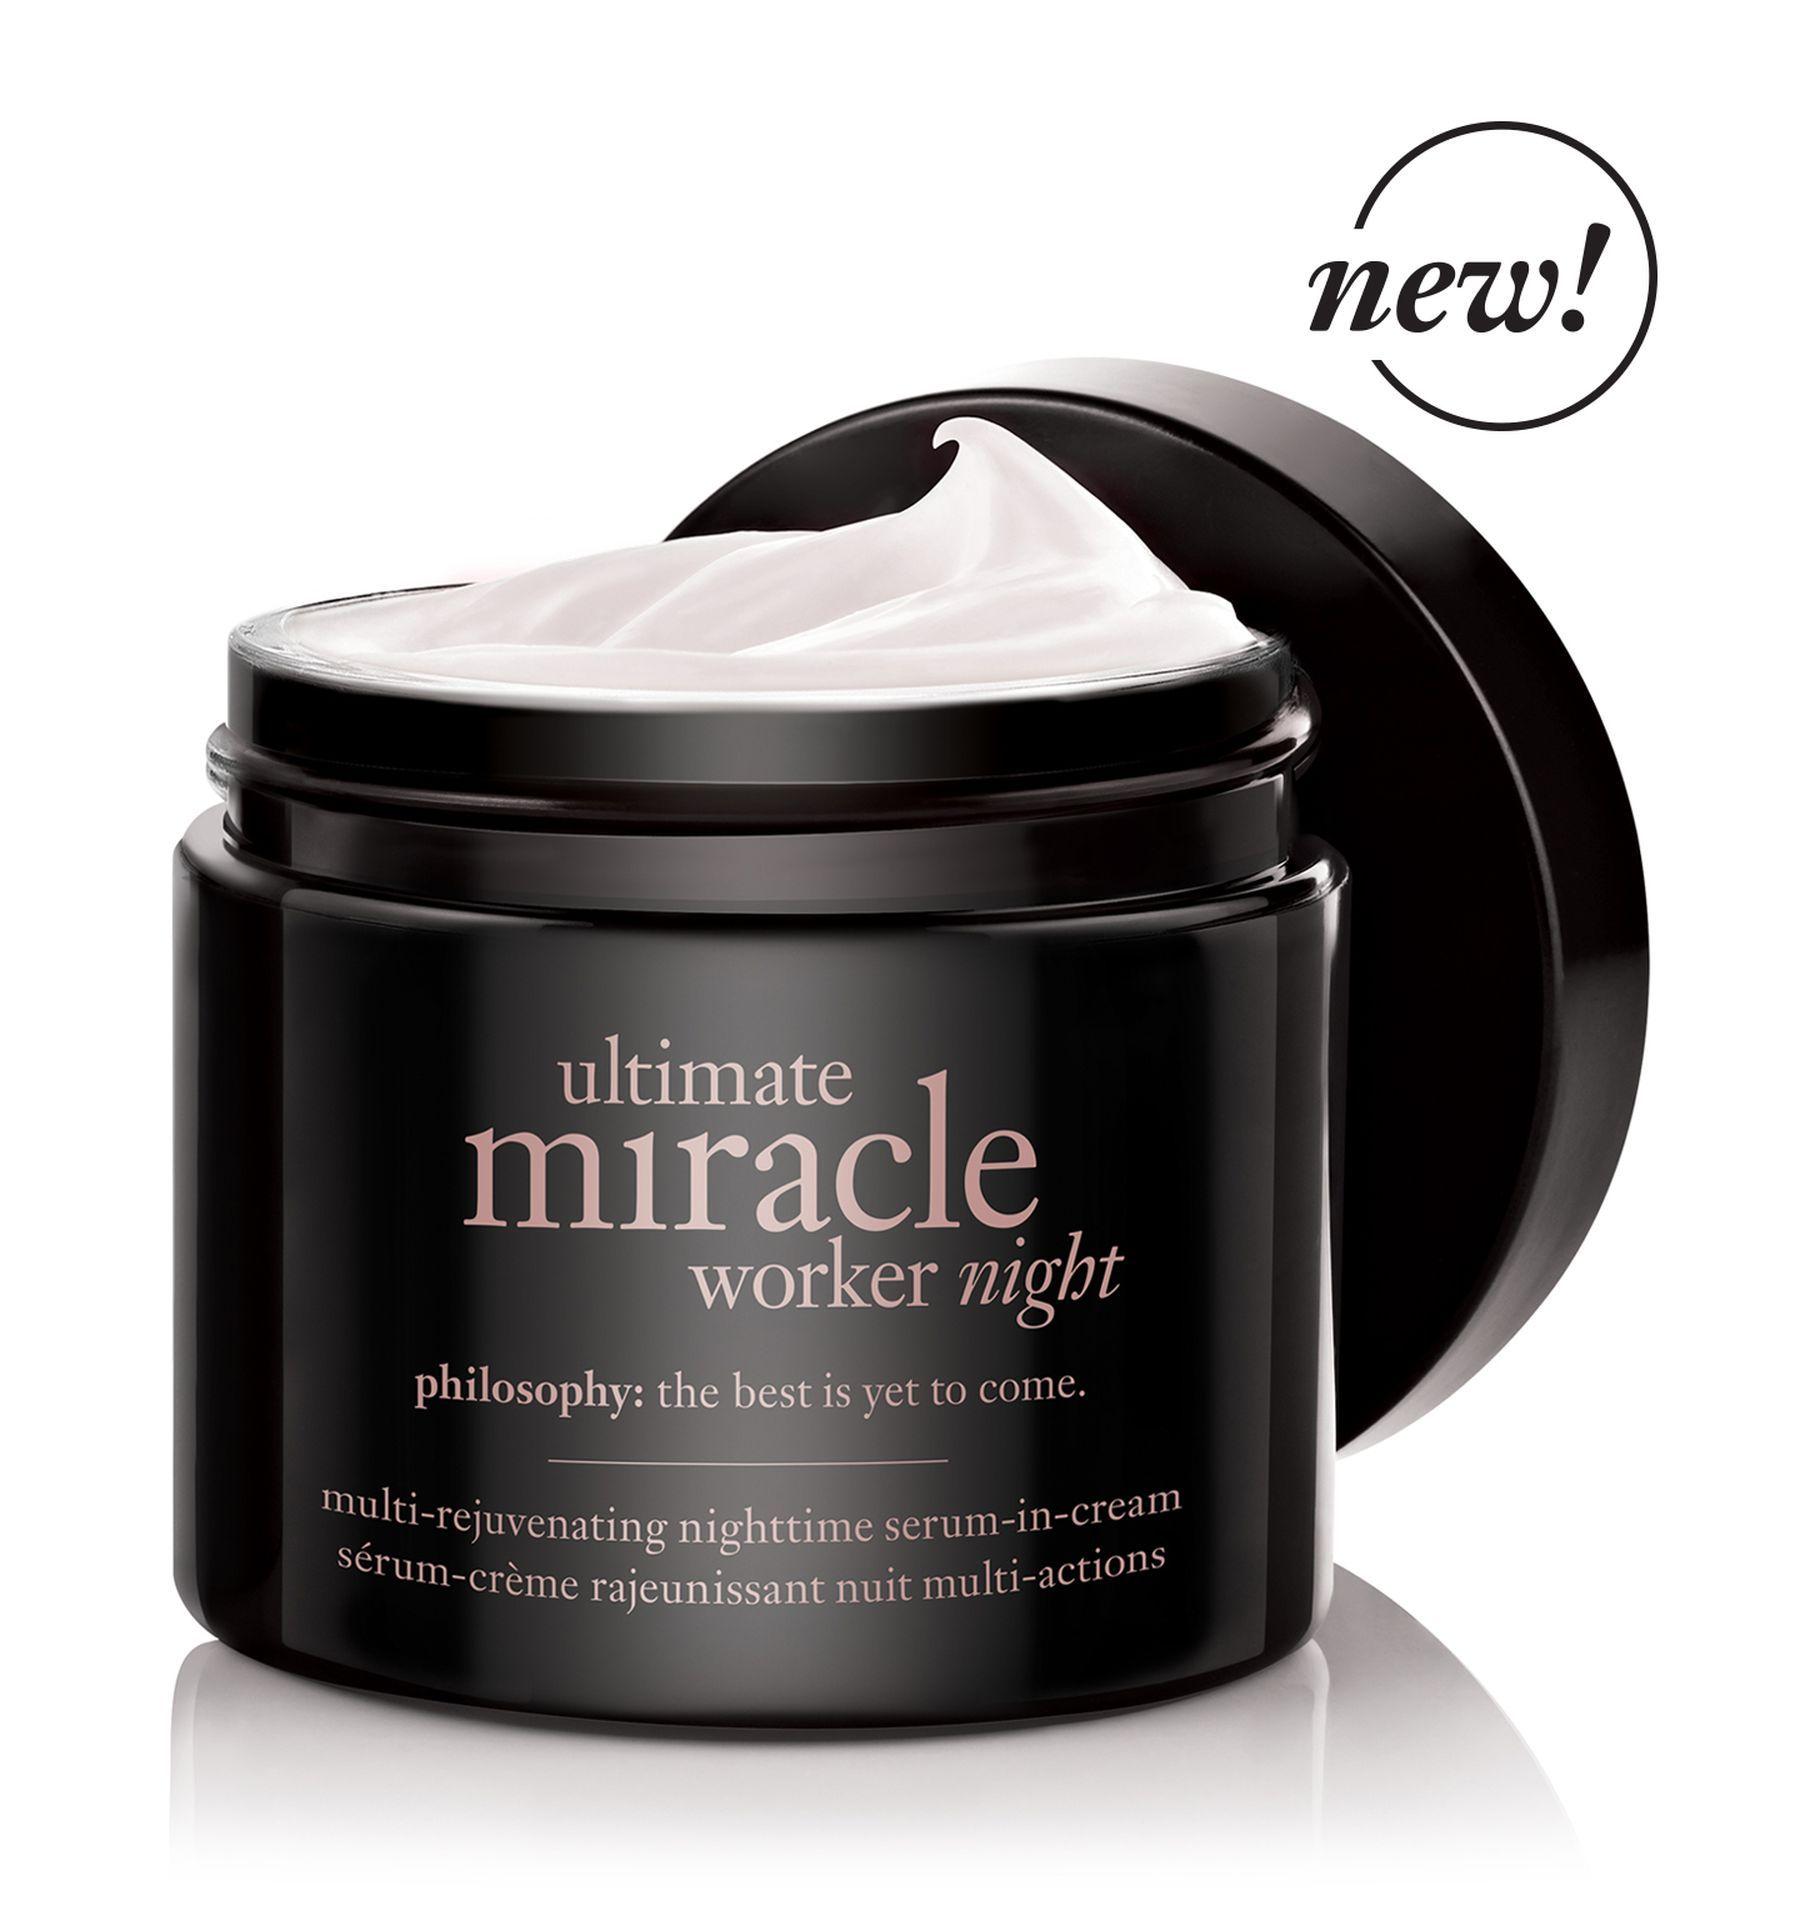 Ultimate Miracle Worker Night Overnight Moisturizer Night Serum Night Creams